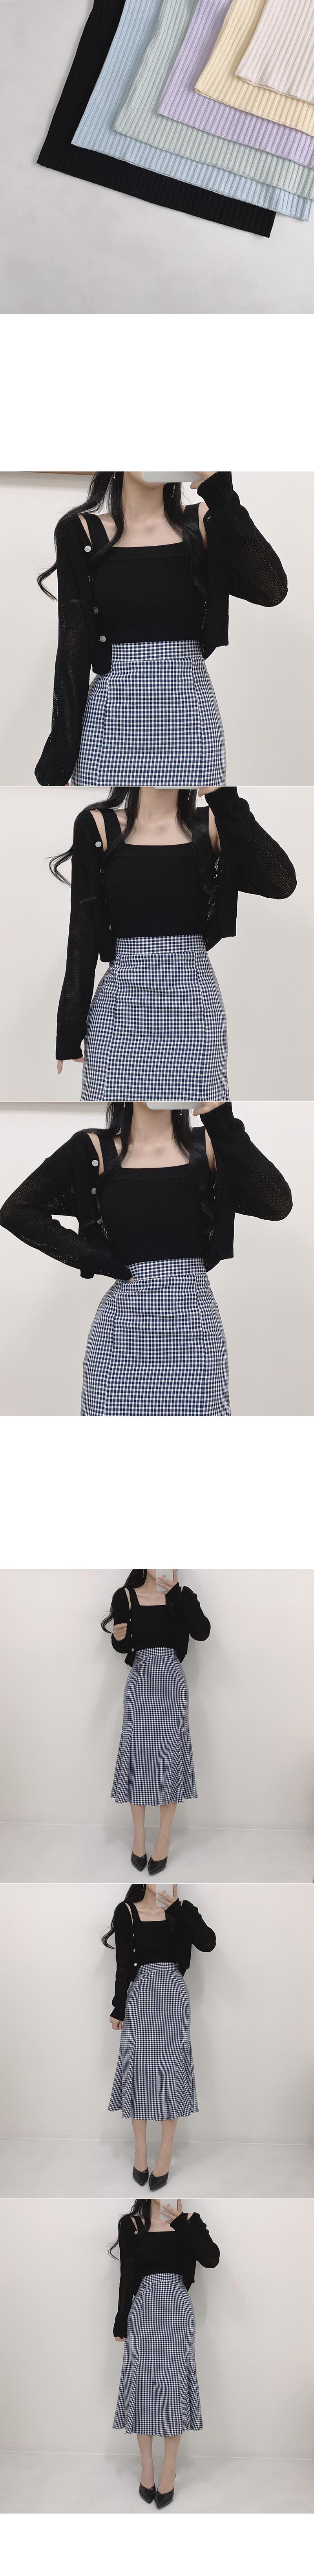 Celine Ribbed Knitwear Sleeveless Top